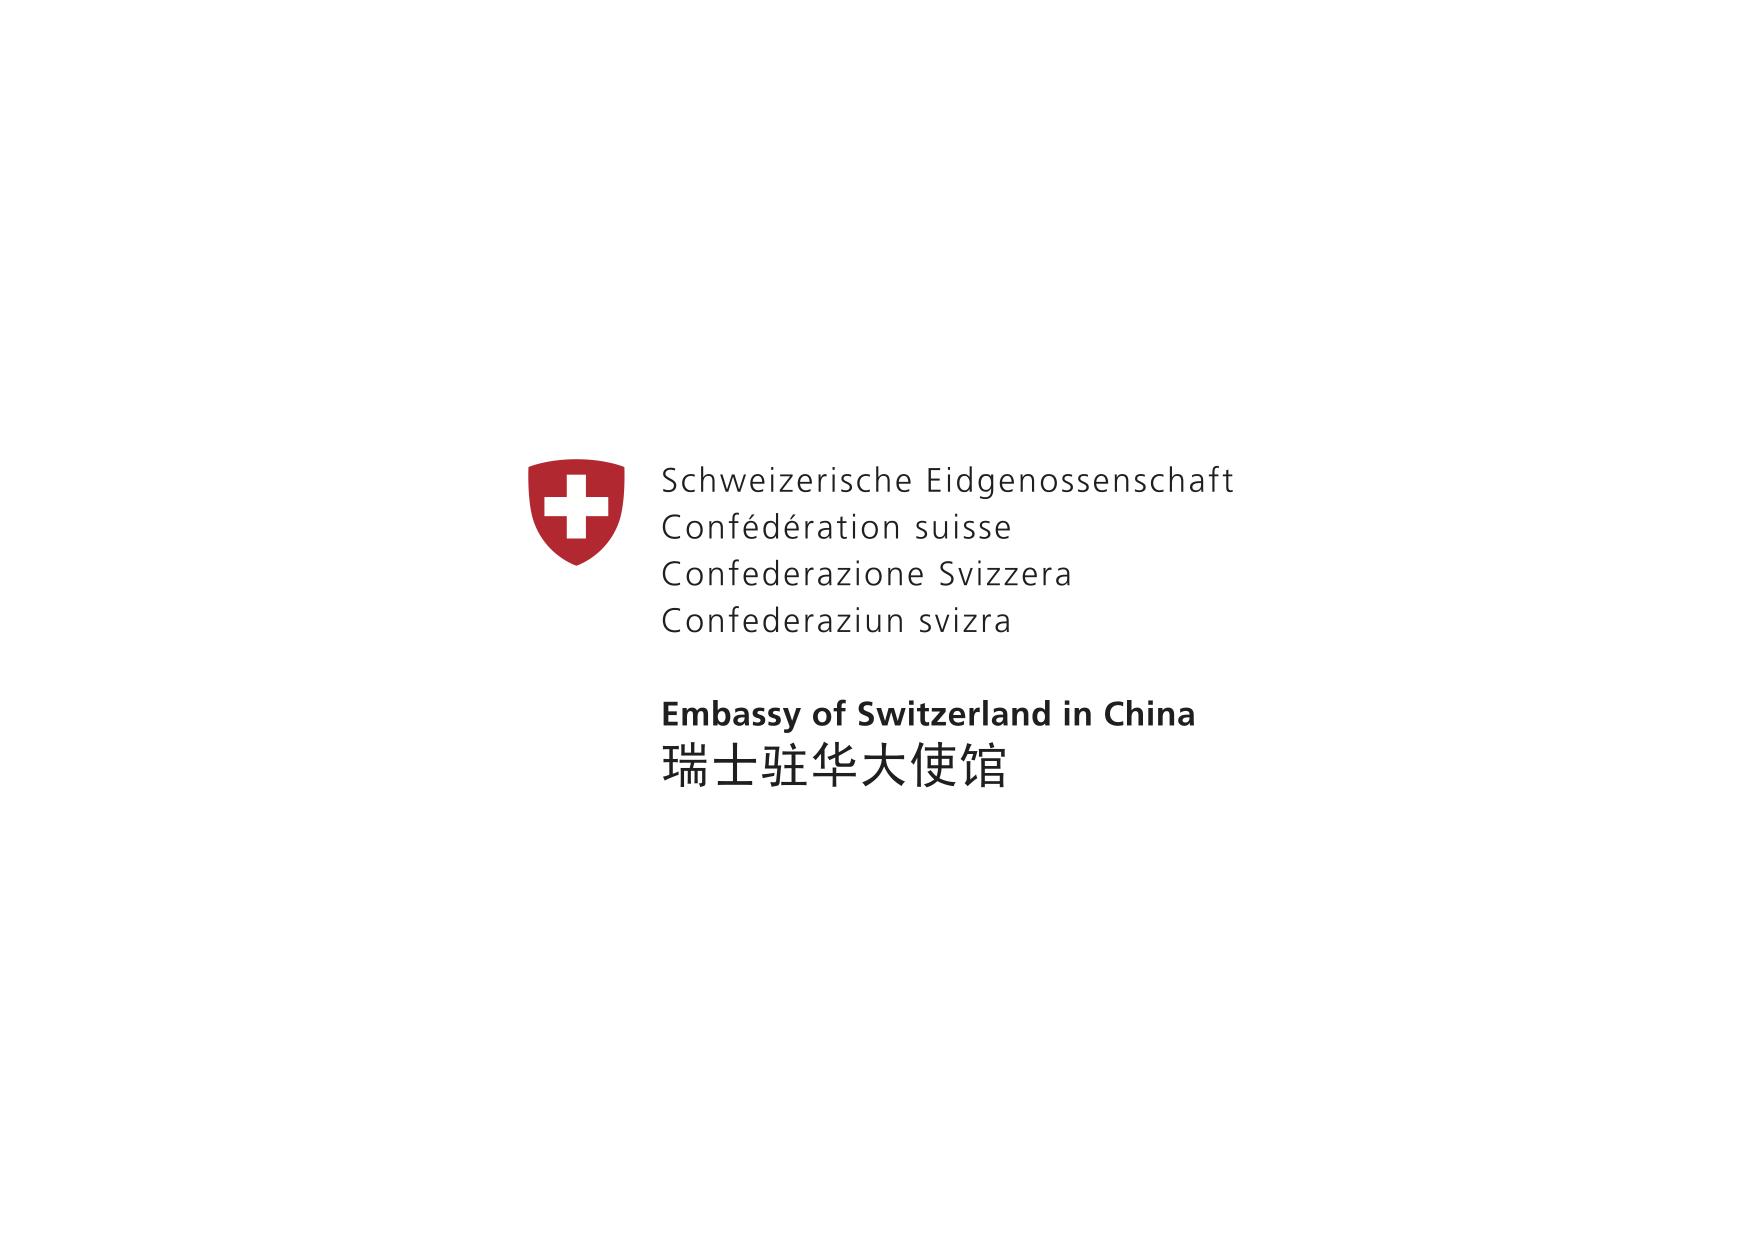 Swiss Embassy_logo.png